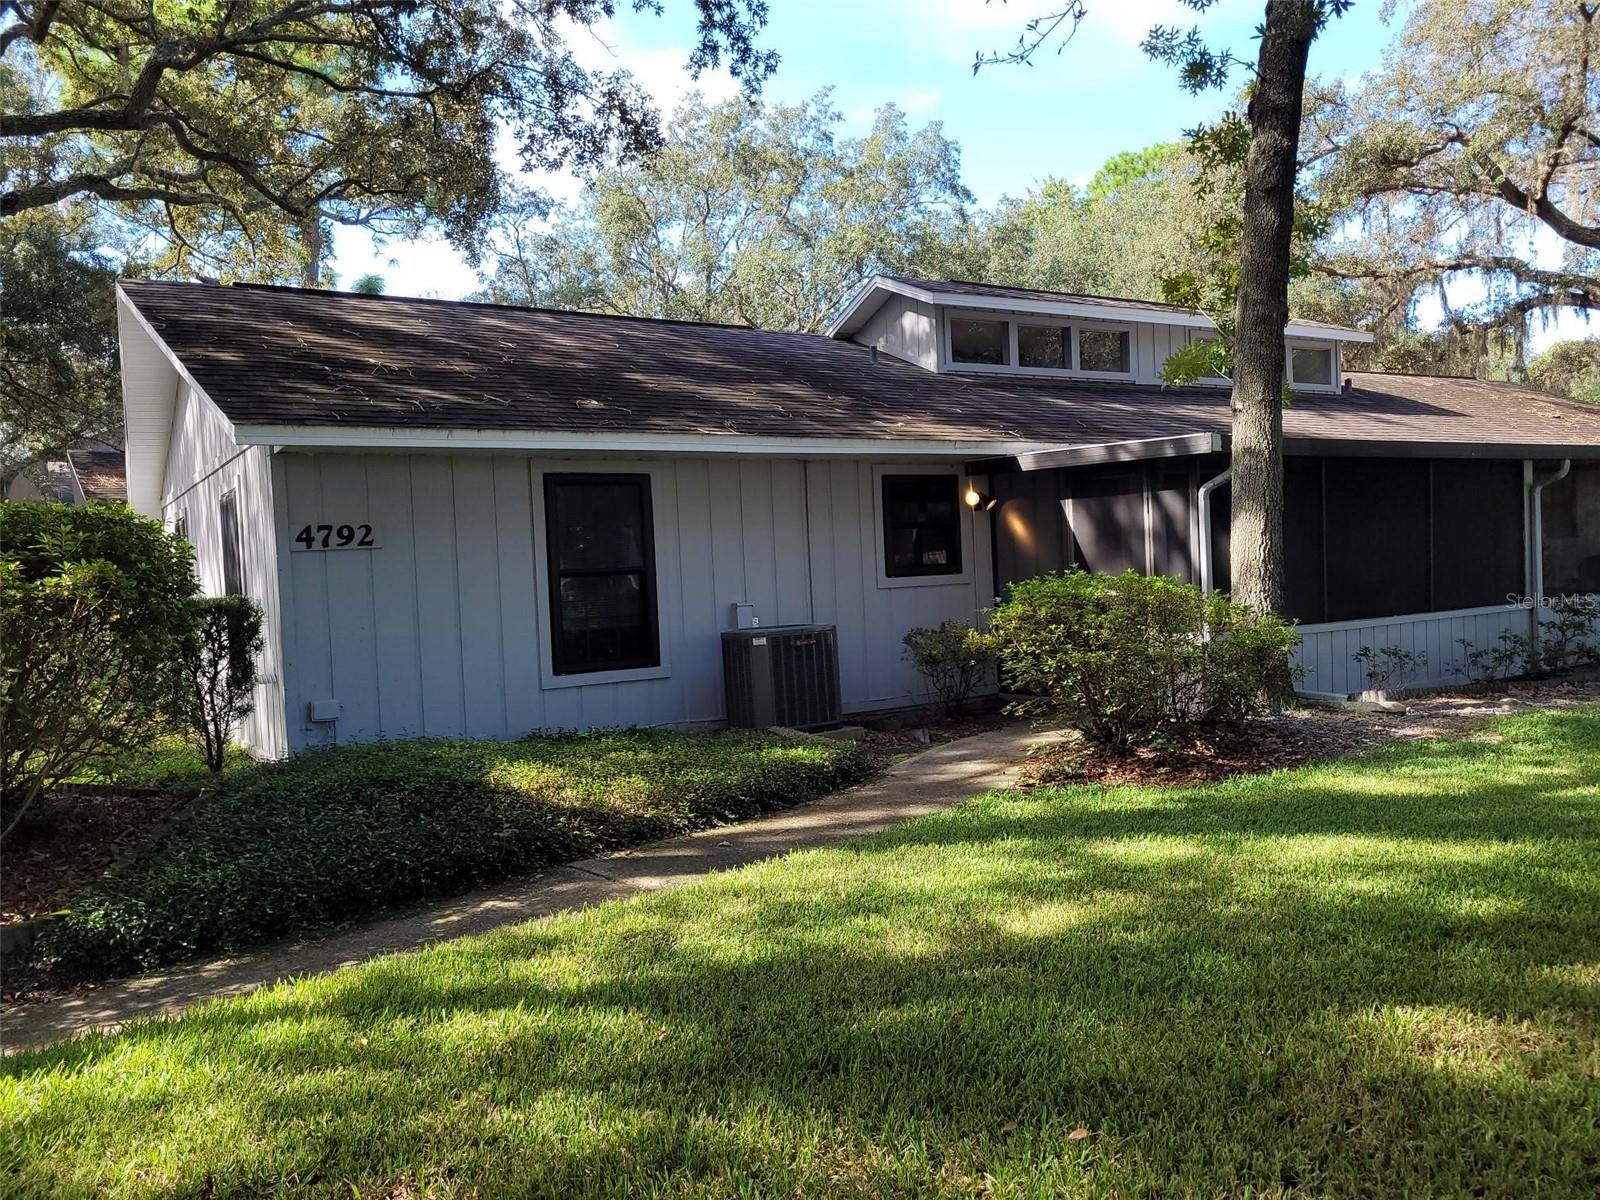 4792 LAKE RIDGE RD #61, Orlando, FL 32808 - MLS#: O5974697